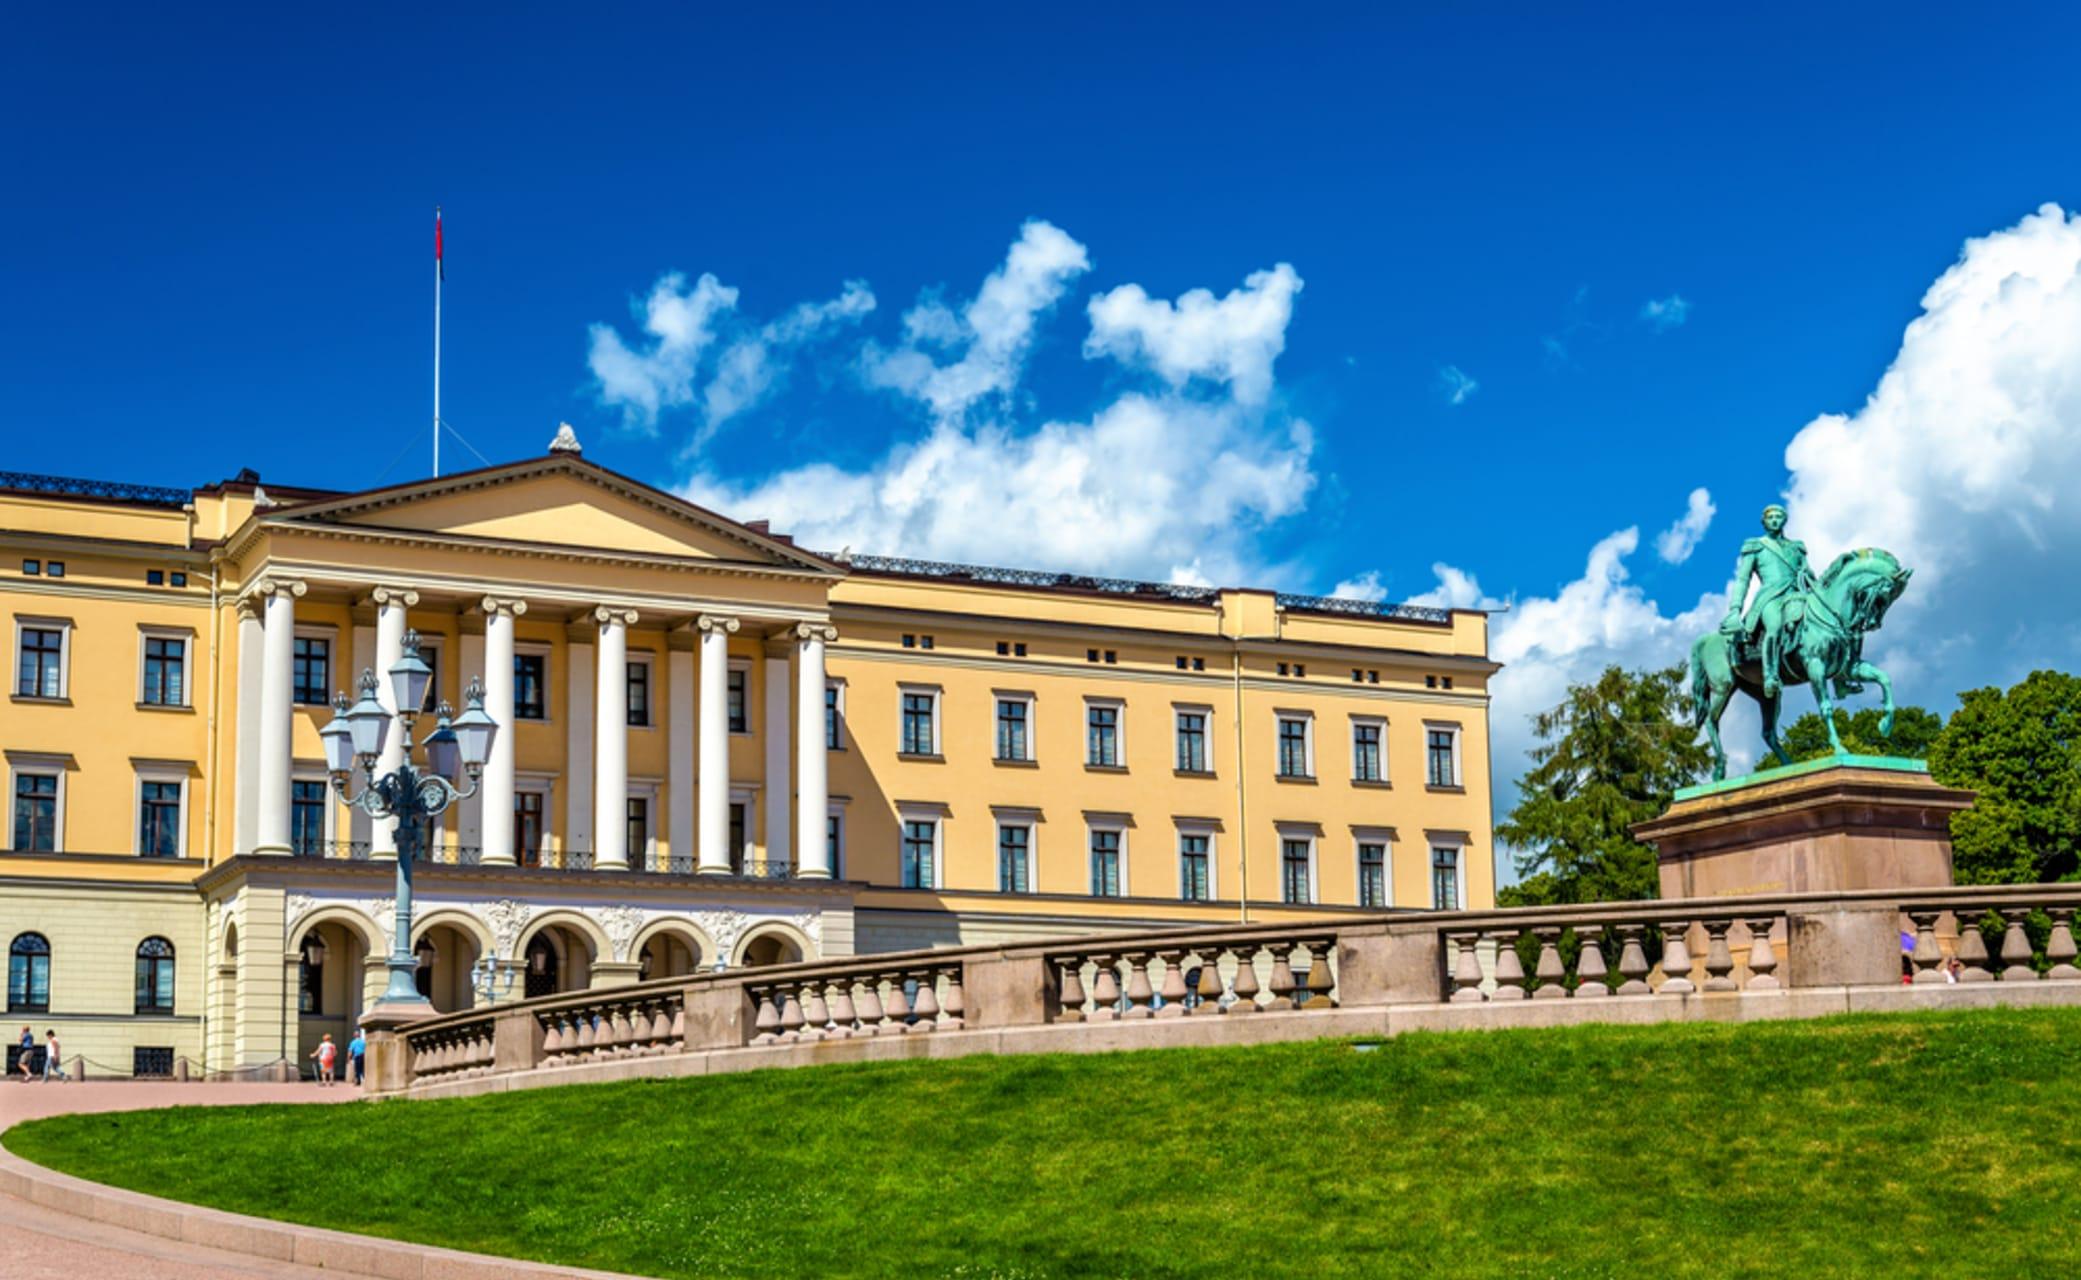 Oslo - Royal Oslo: Evolution of Monarchy in Norway